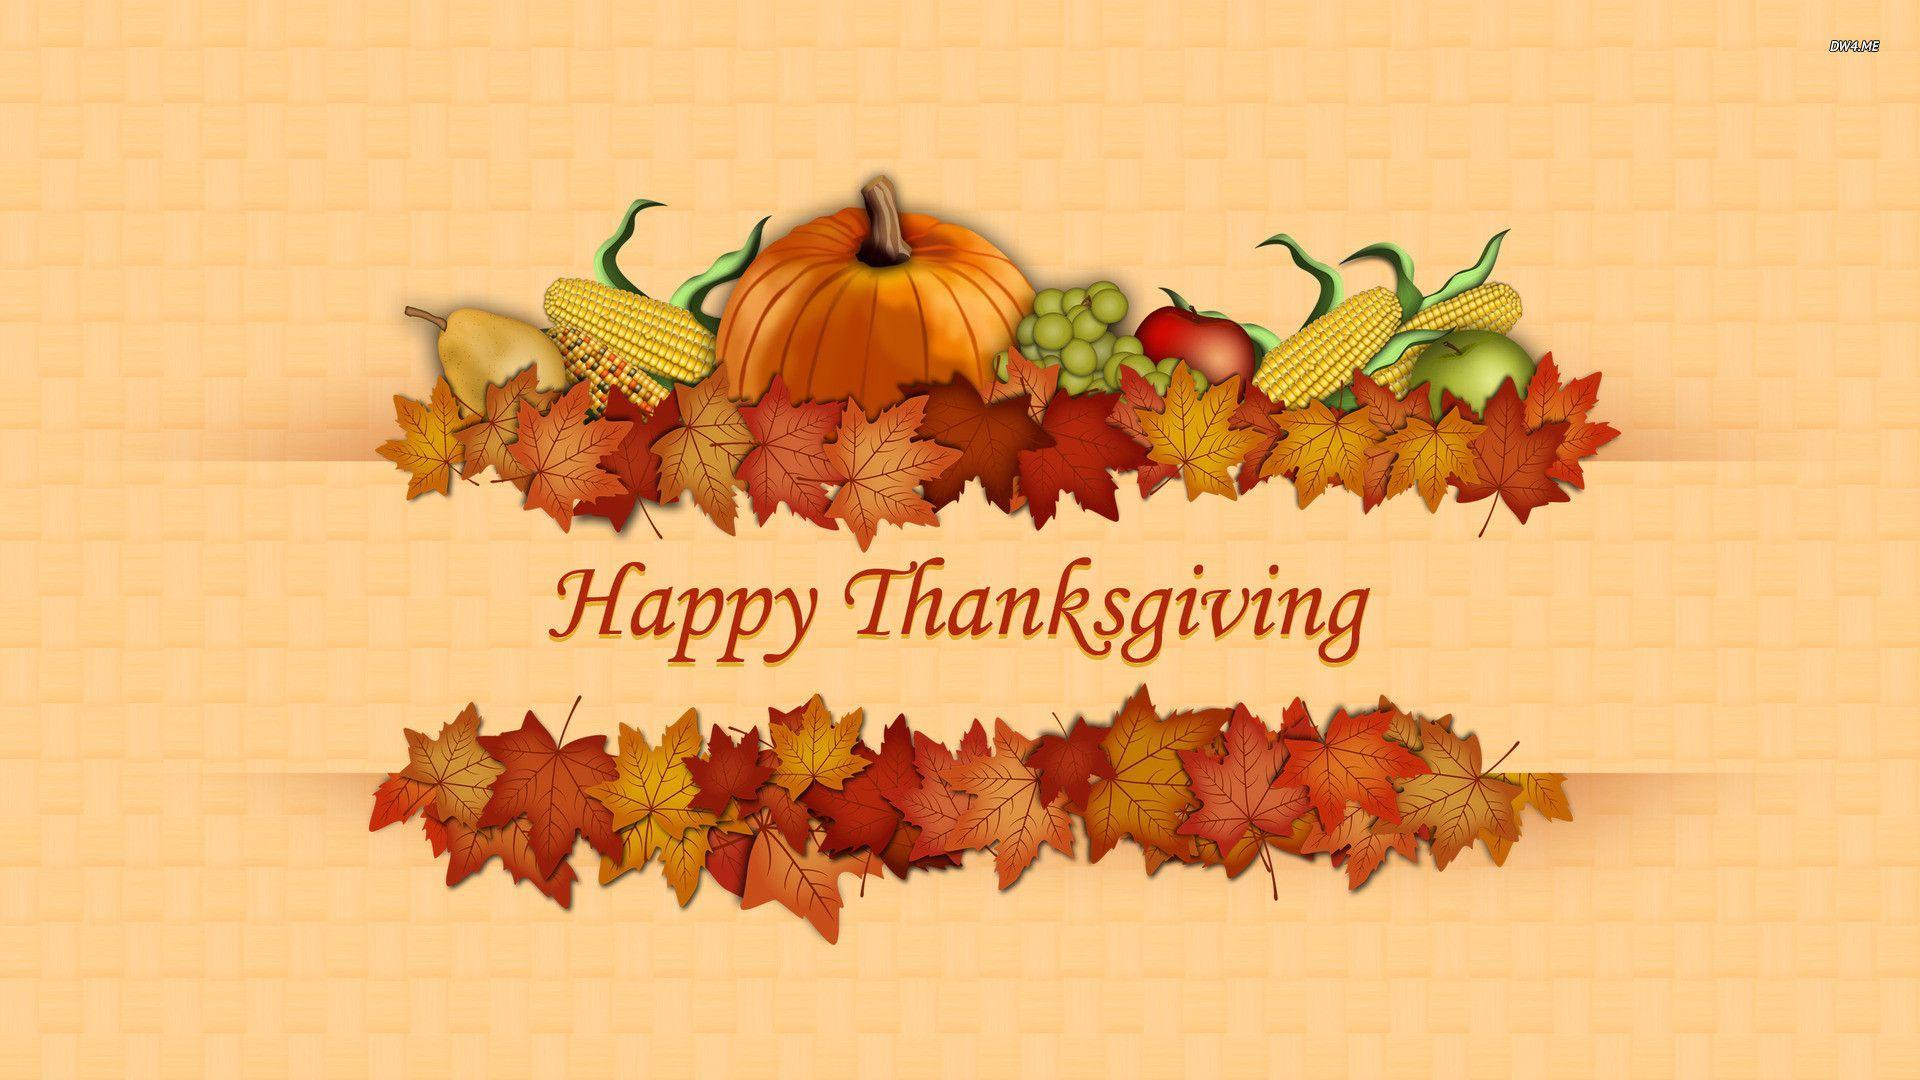 Happy thanksgiving desktop wallpaper   SF Wallpaper 1920x1080